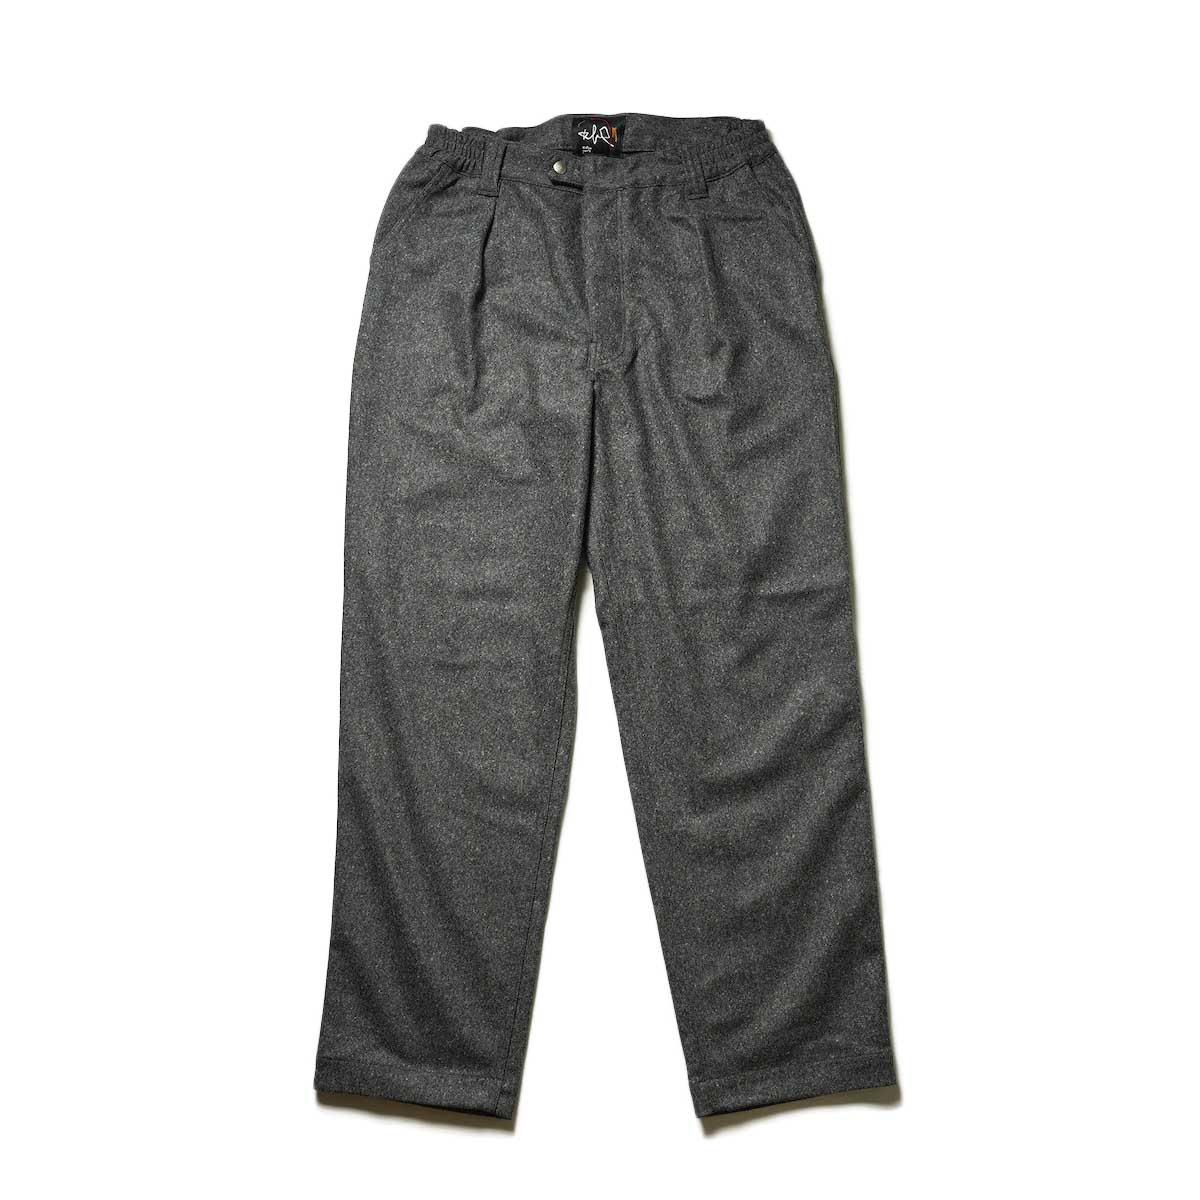 Willow Pants / P-008 - NEP WOOL PANTS (Gray)